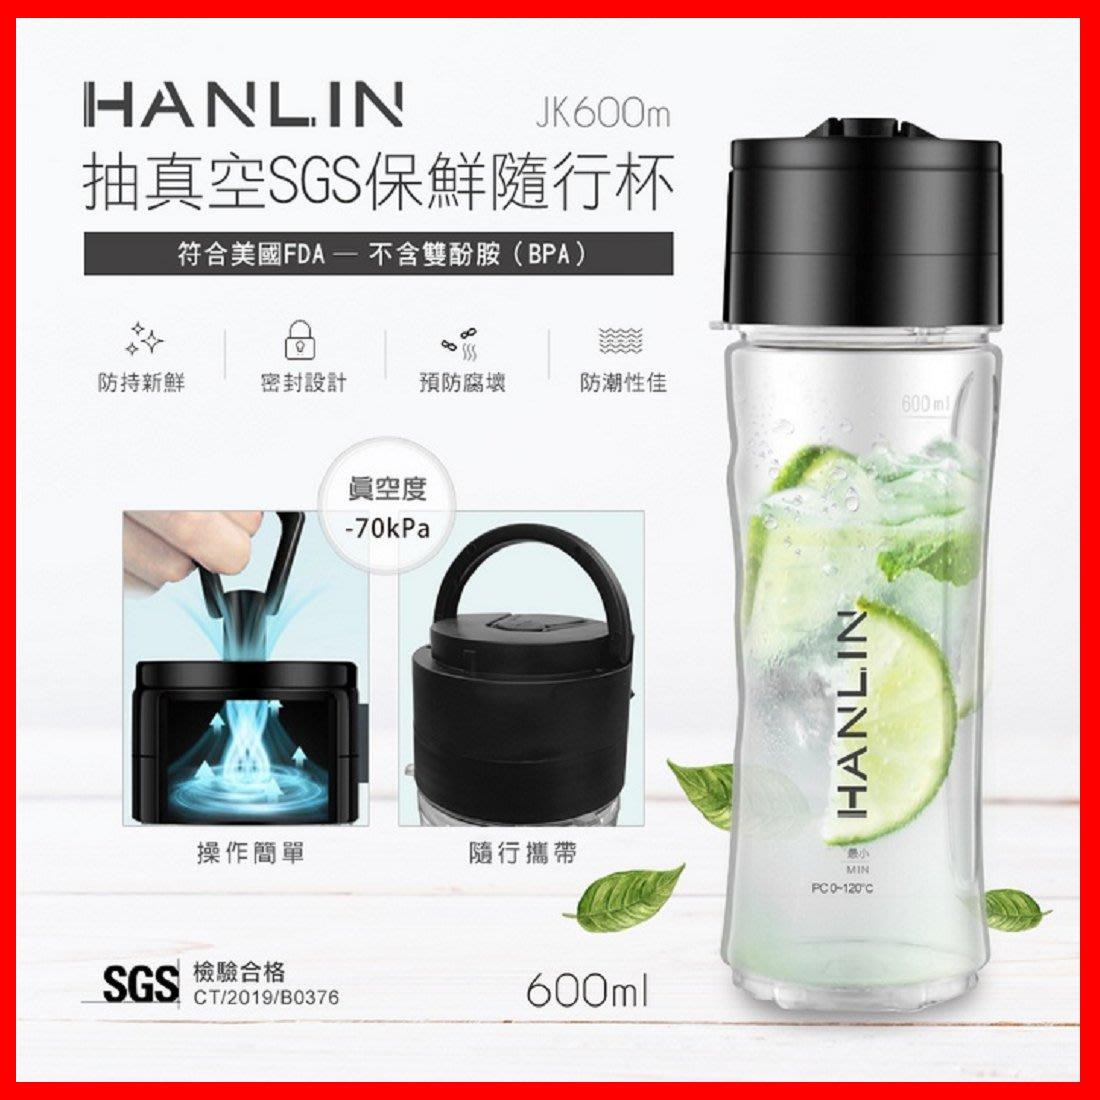 HANLIN-JK600m 合格抽真空保鮮環保杯(耐熱)SGS 隨行杯 手搖杯 茶壺 水壺 手拿杯 700ml